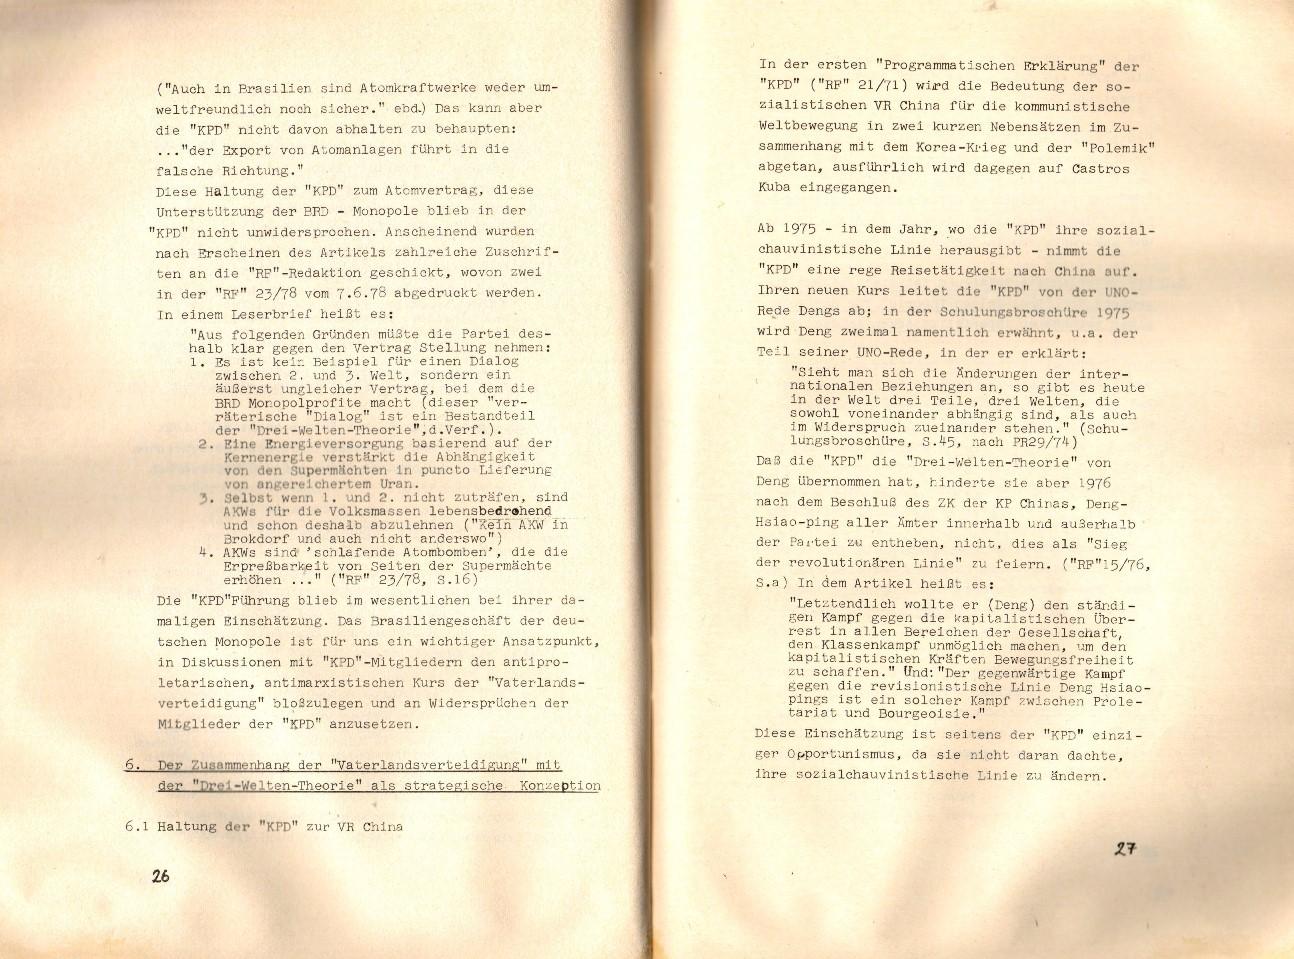 KABD_1978_Argumentationshilfen_15